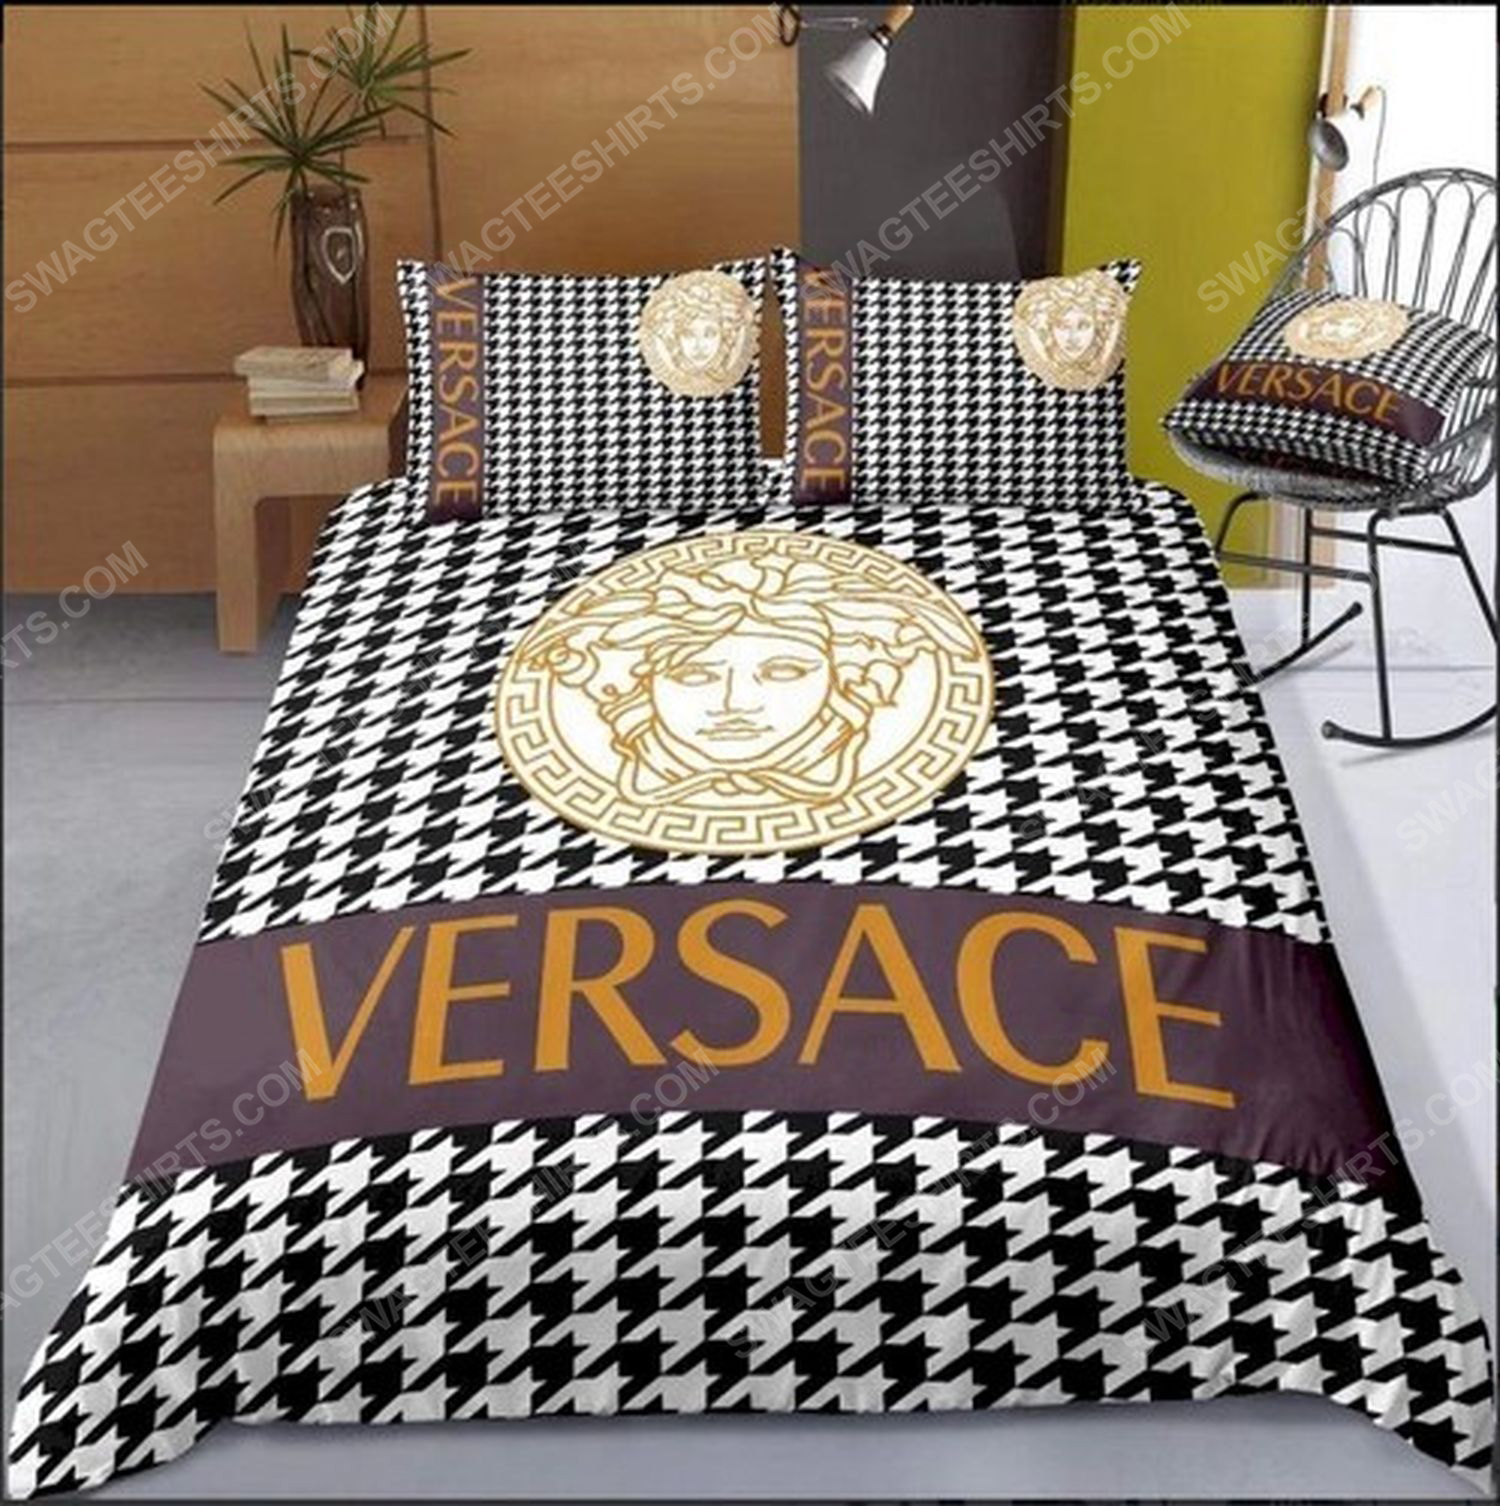 Versace home monogram full print duvet cover bedding set 3 - Copy